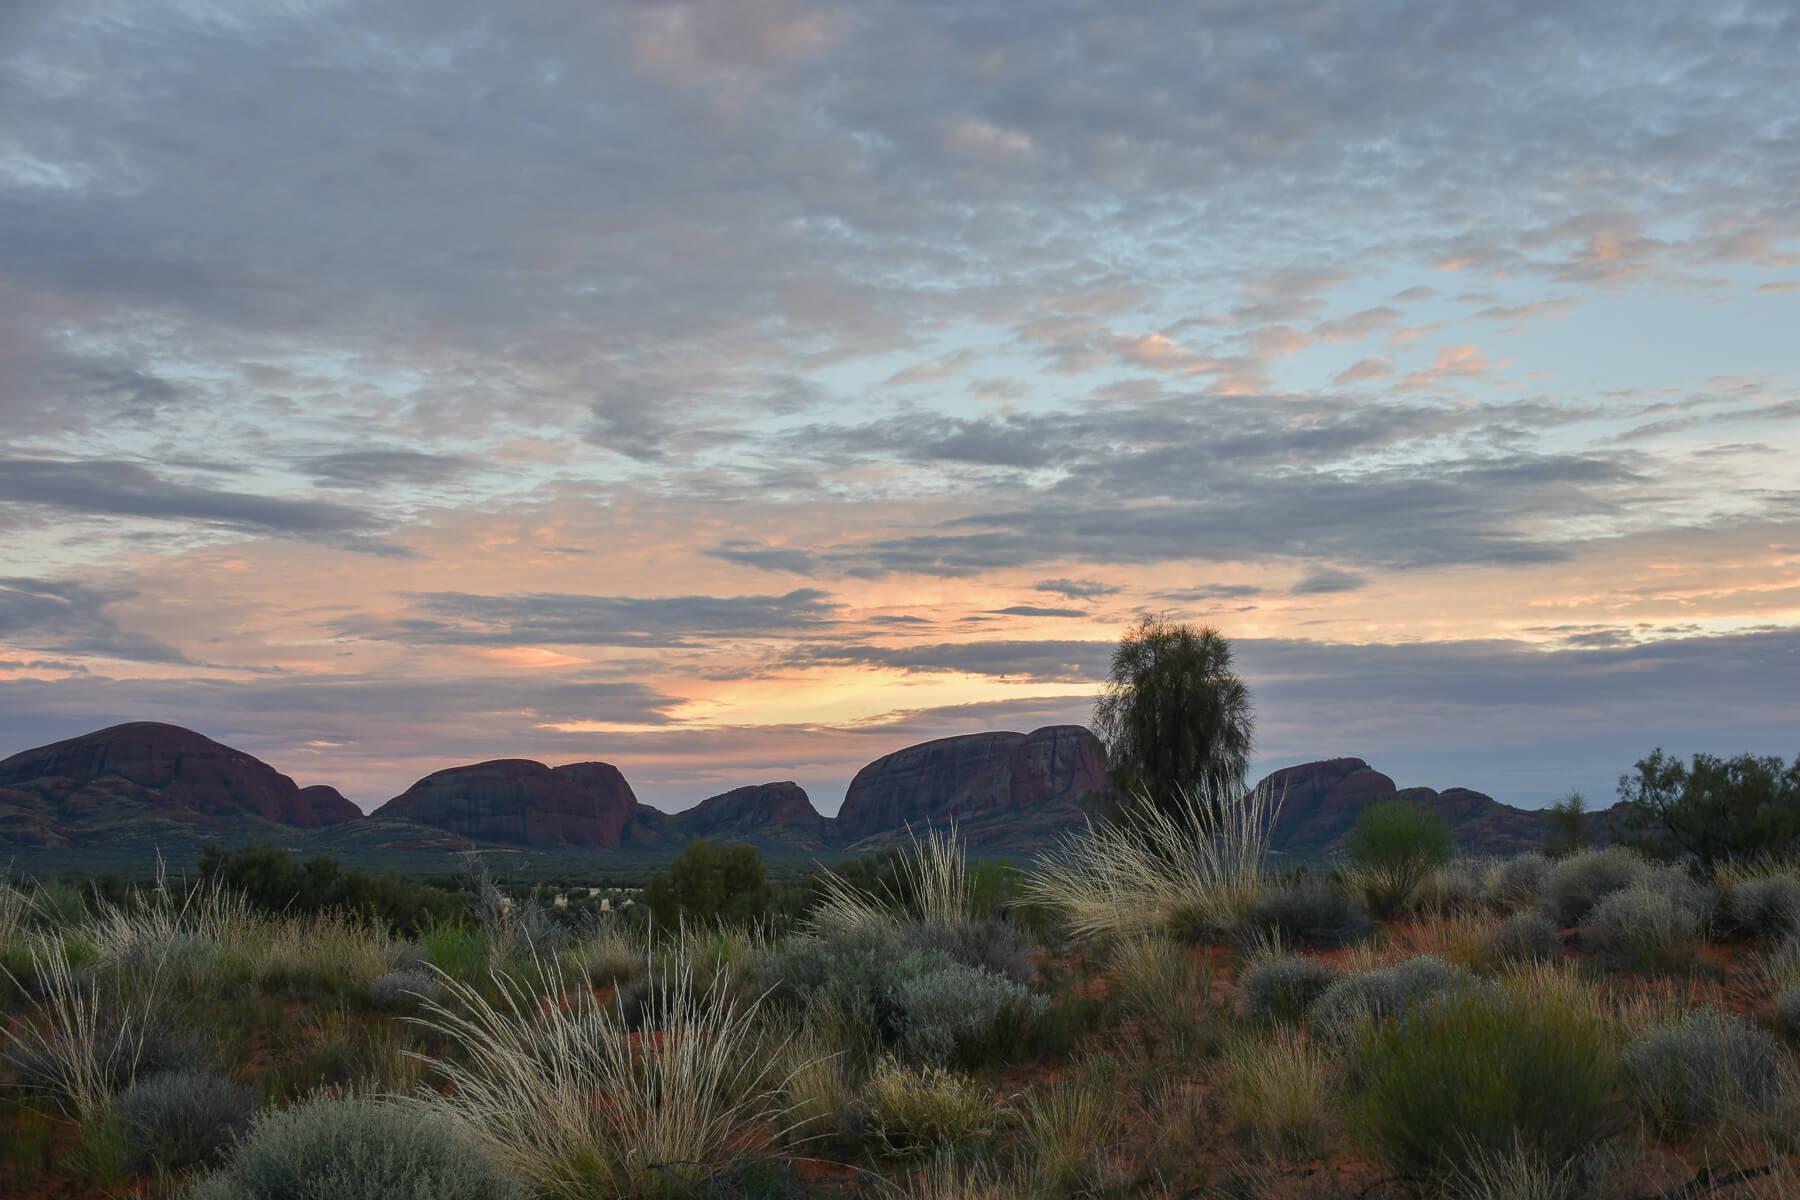 Sunrise forming over Kata Tjuta in the distance